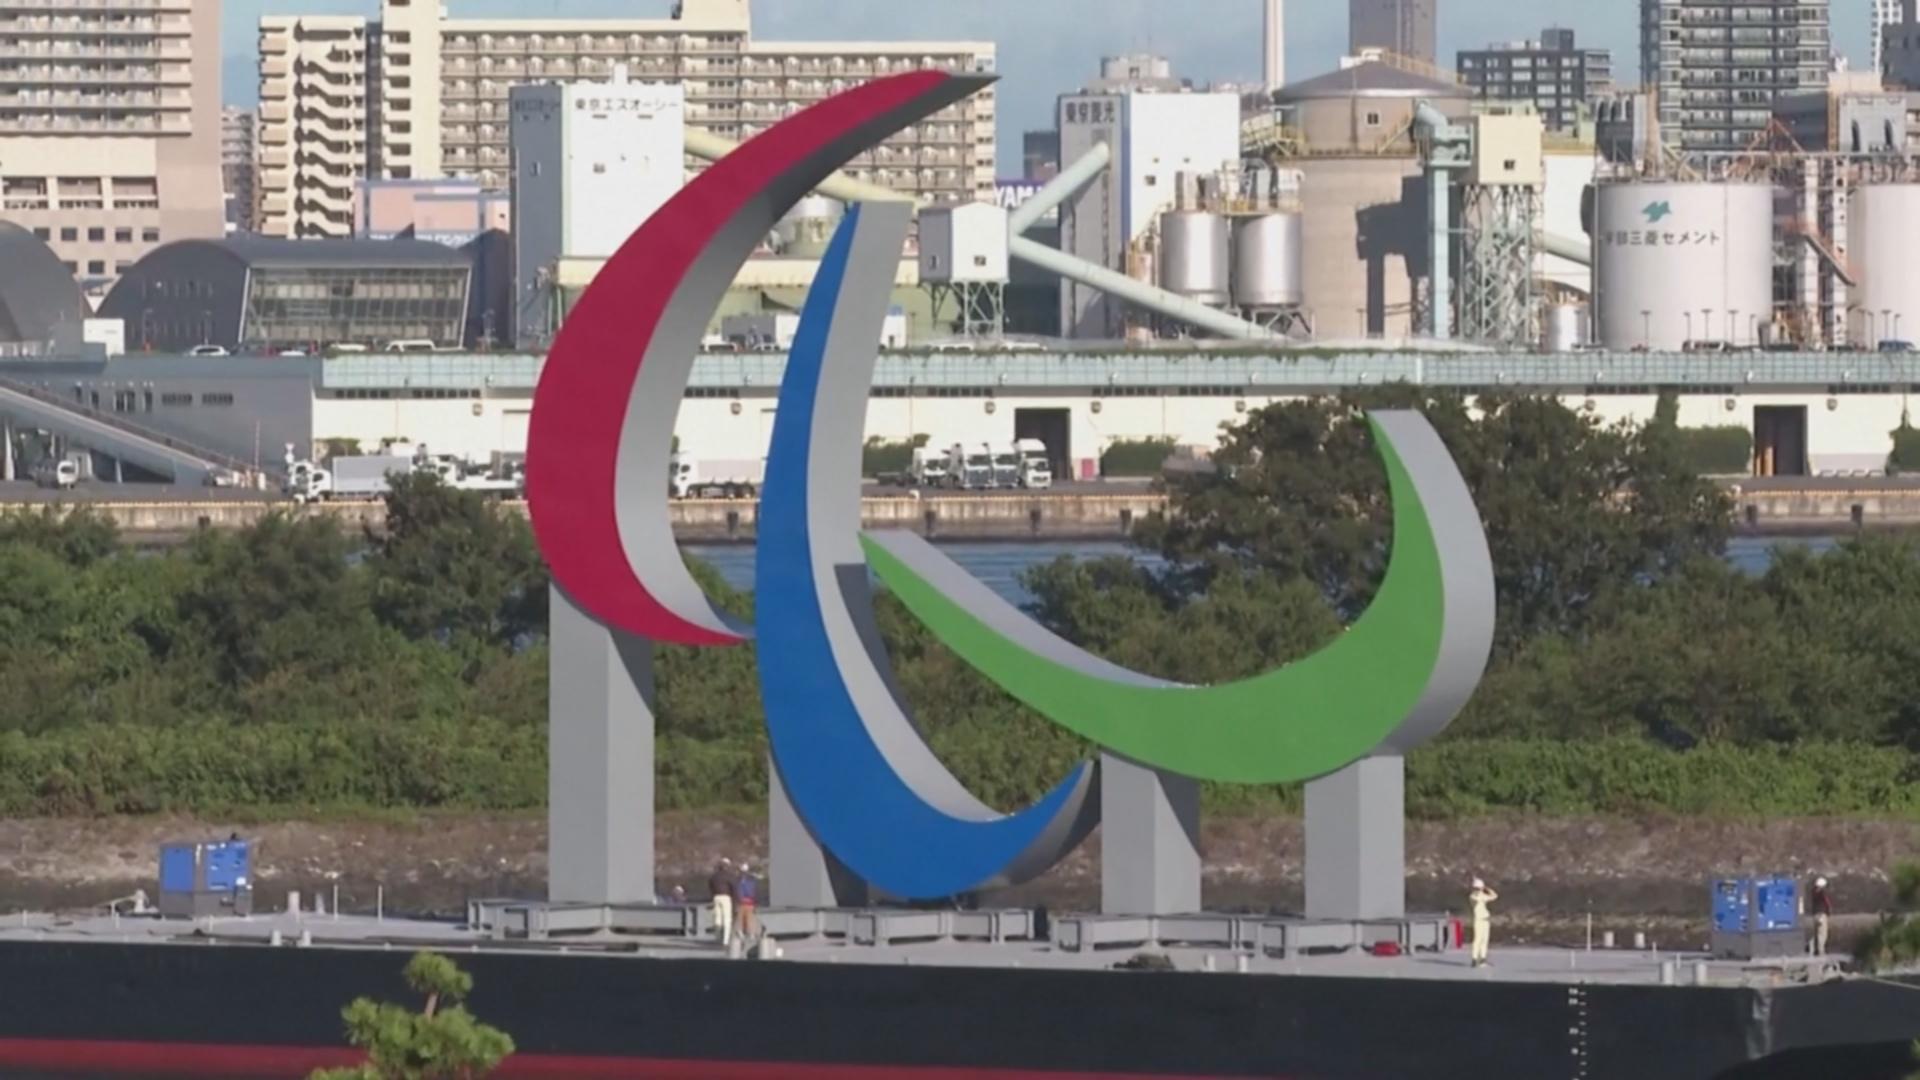 Символ Паралимпиады доставили в Токийский залив